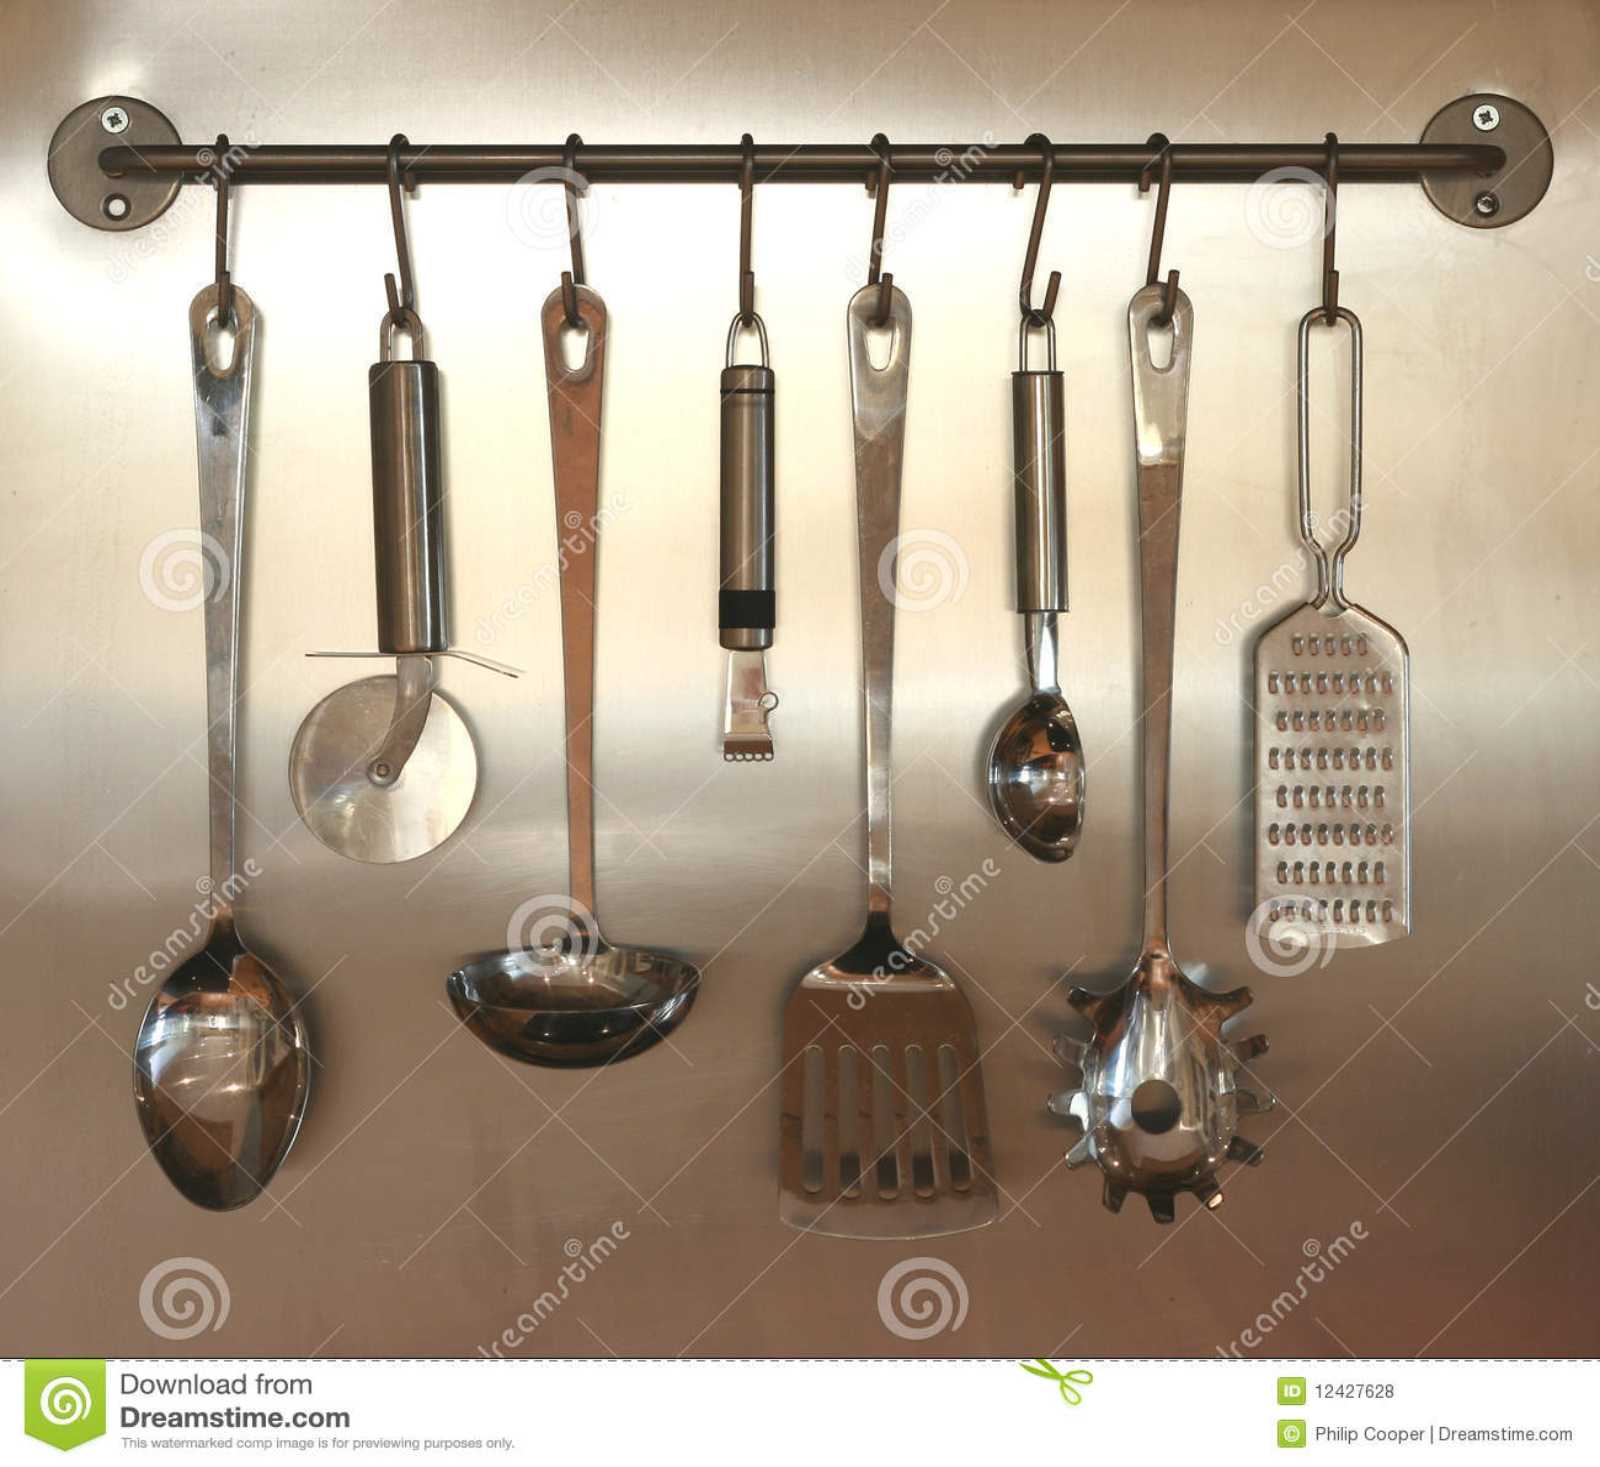 Good Kitchen Utensils Hanging On Wall Royalty Free Stock Photos